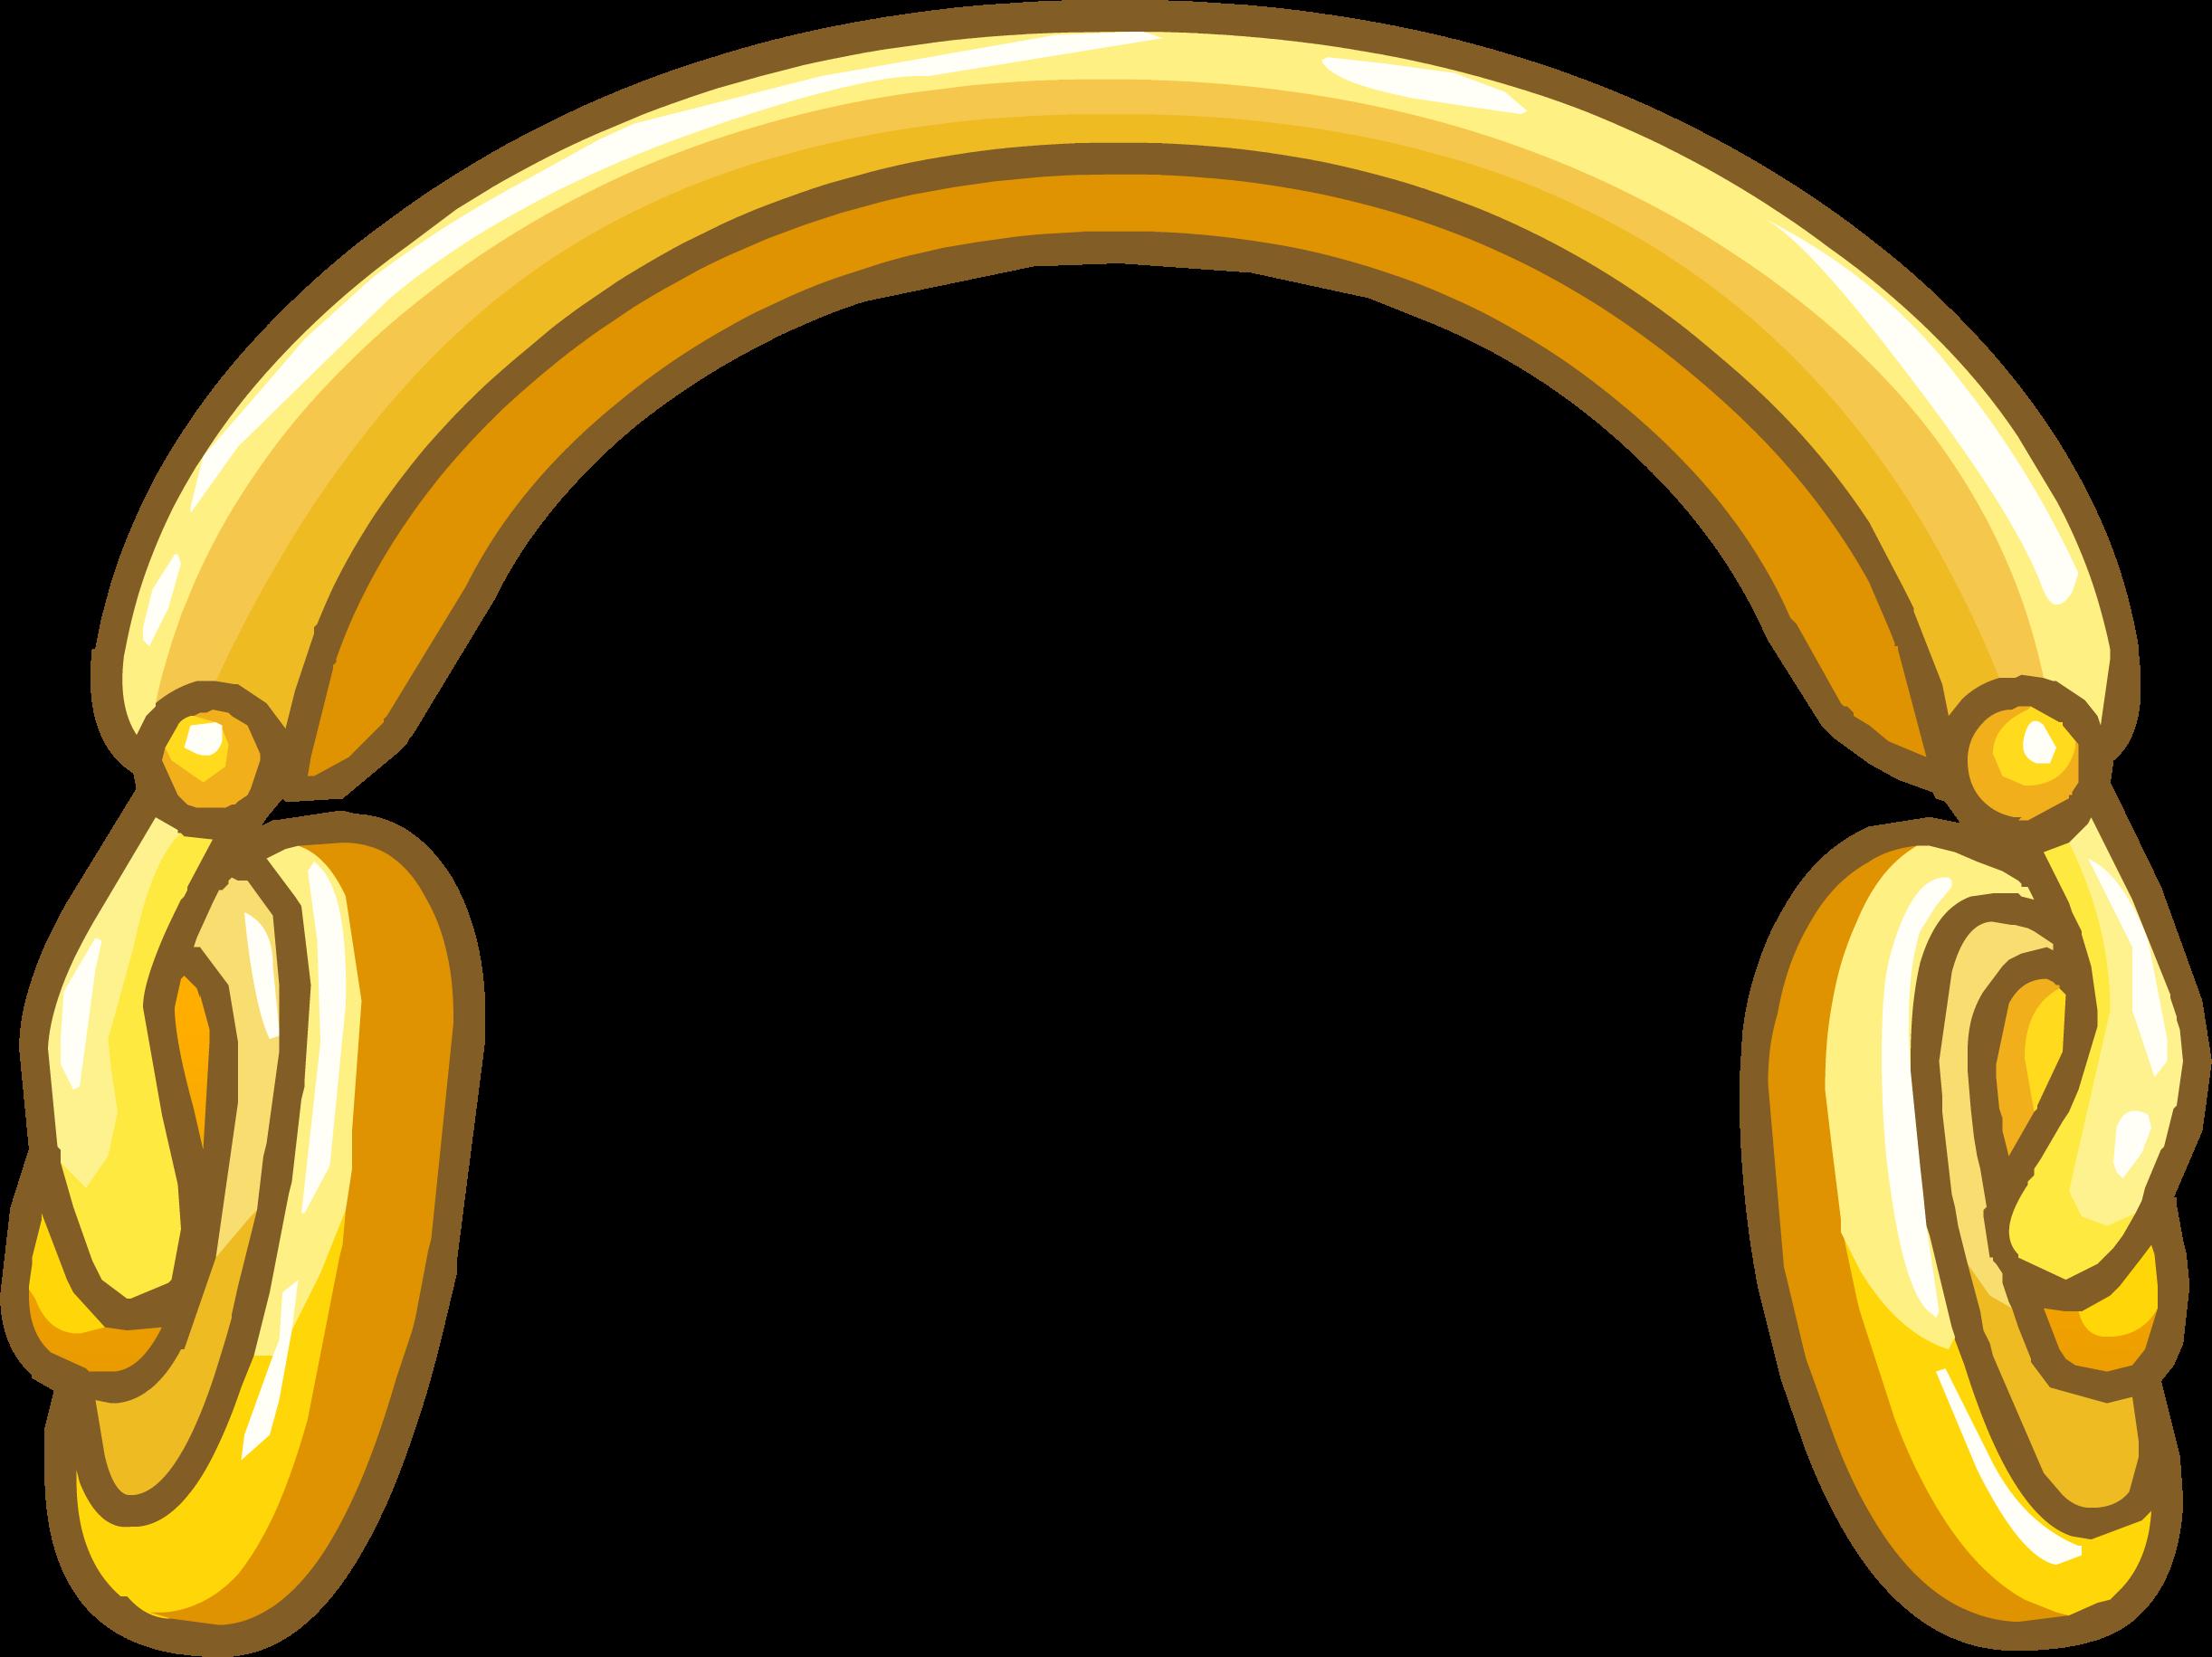 Golden Headphones Club Penguin Wiki The Free Editable